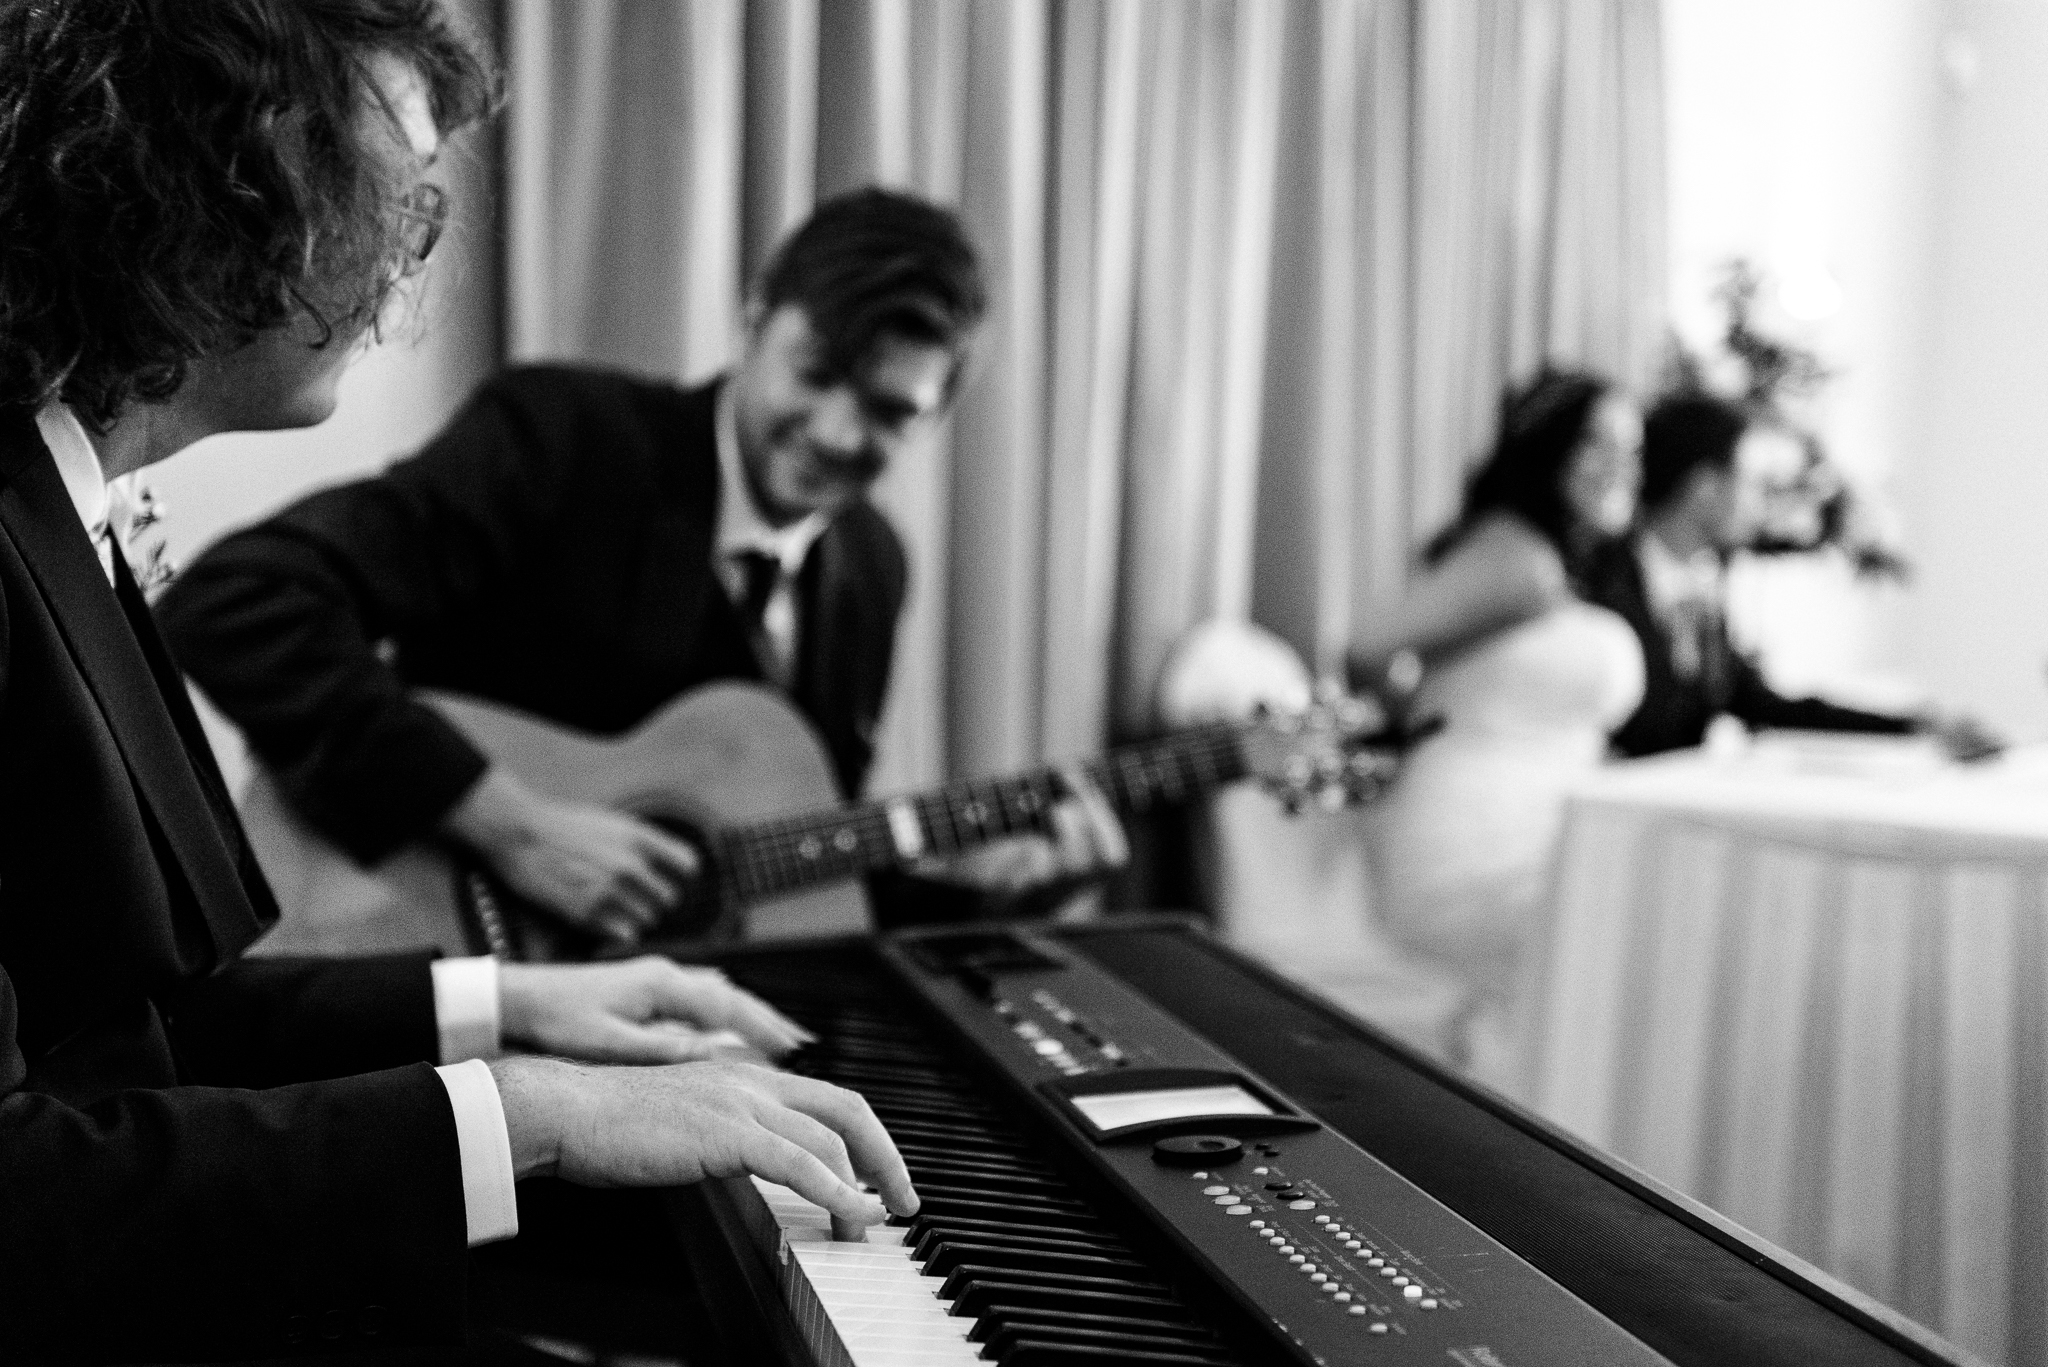 Relaxed Summer Wedding at The Manor, Cheadle Guitarist Musicians Vinyl-25.jpg